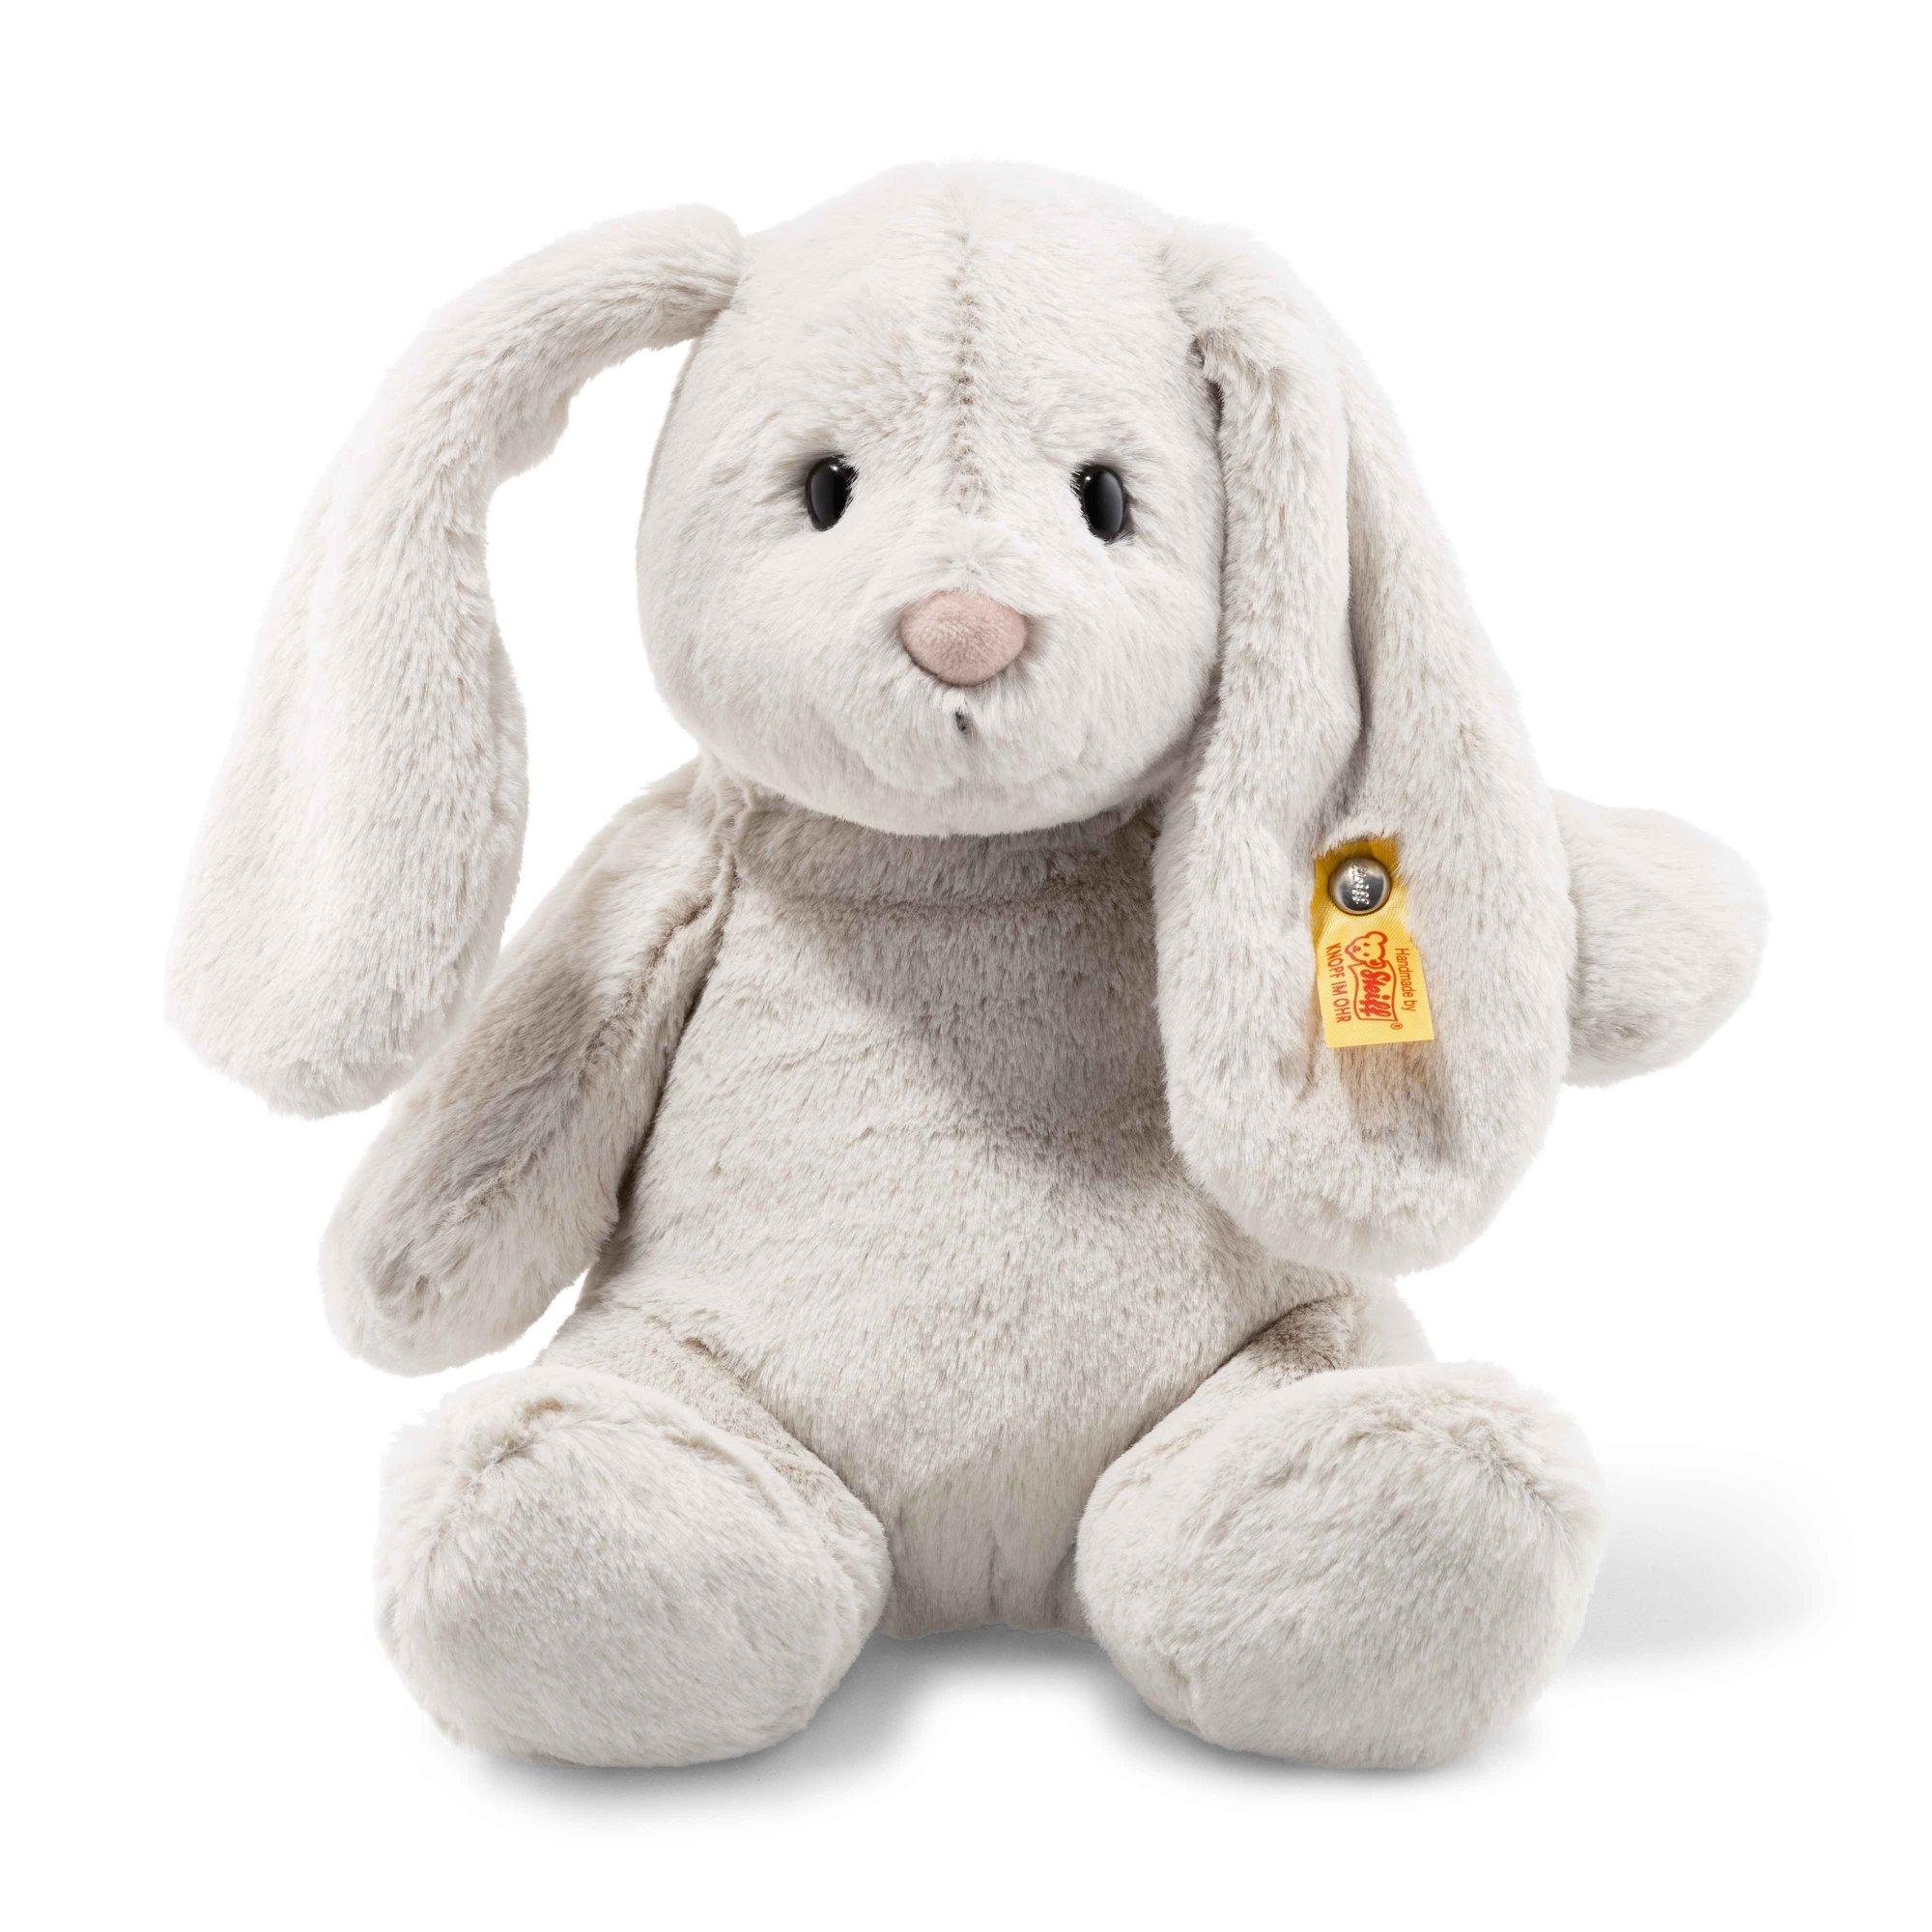 Steiff Stuffed 12'' Bunny Rabbit - Vintage Soft and Cuddly Plush Animal Toy - 12'' Authentic Steiff by Steiff